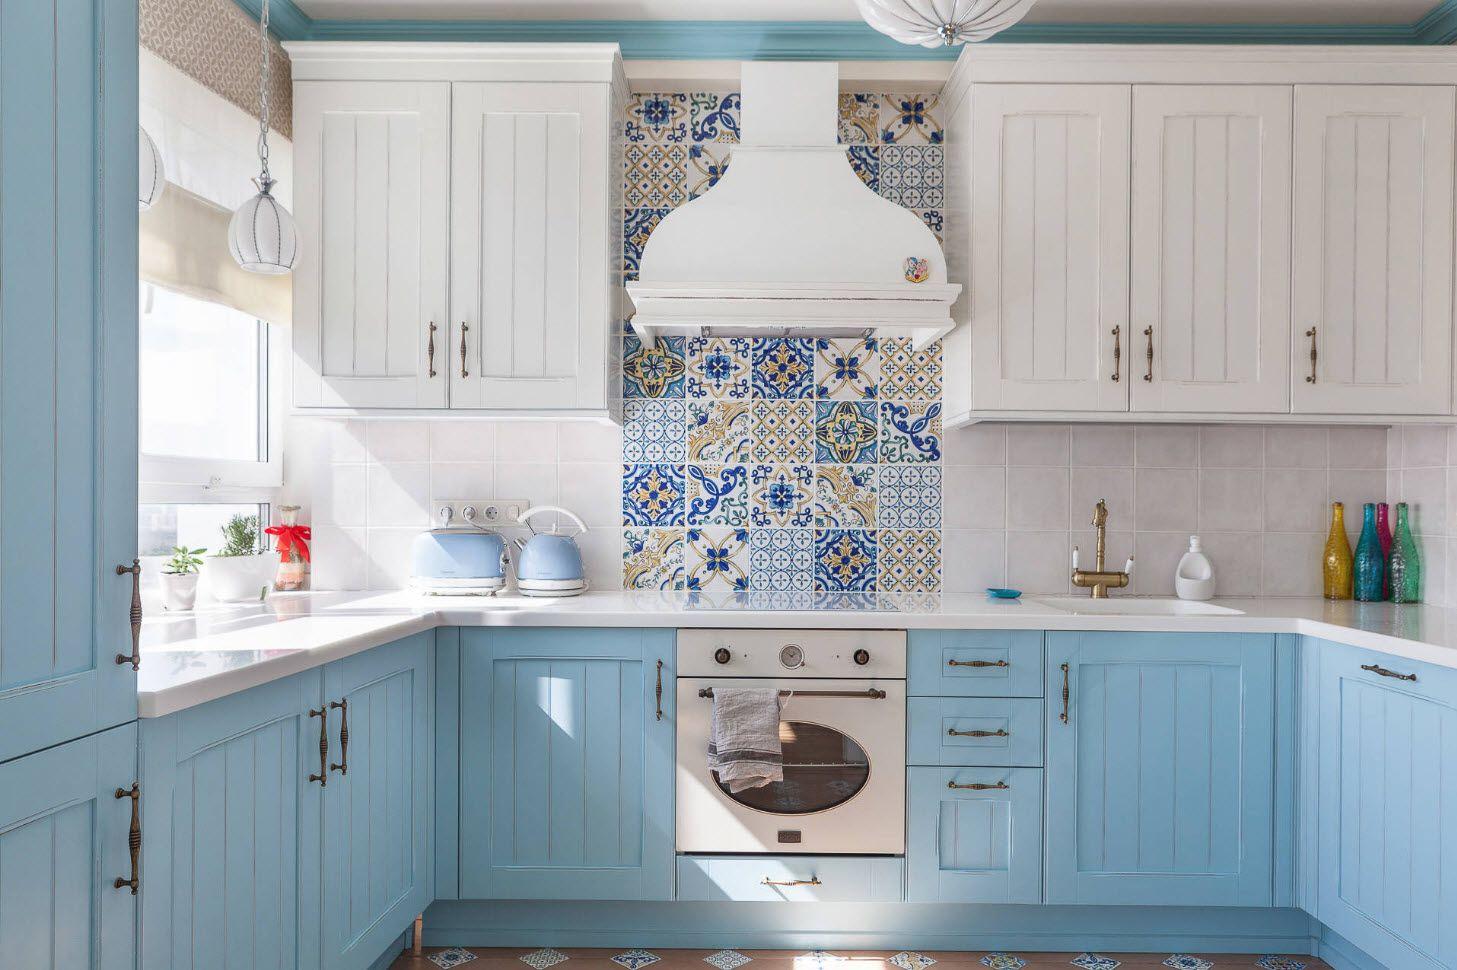 Arabic tiles for backsplash of Mediterranean styled kitchen